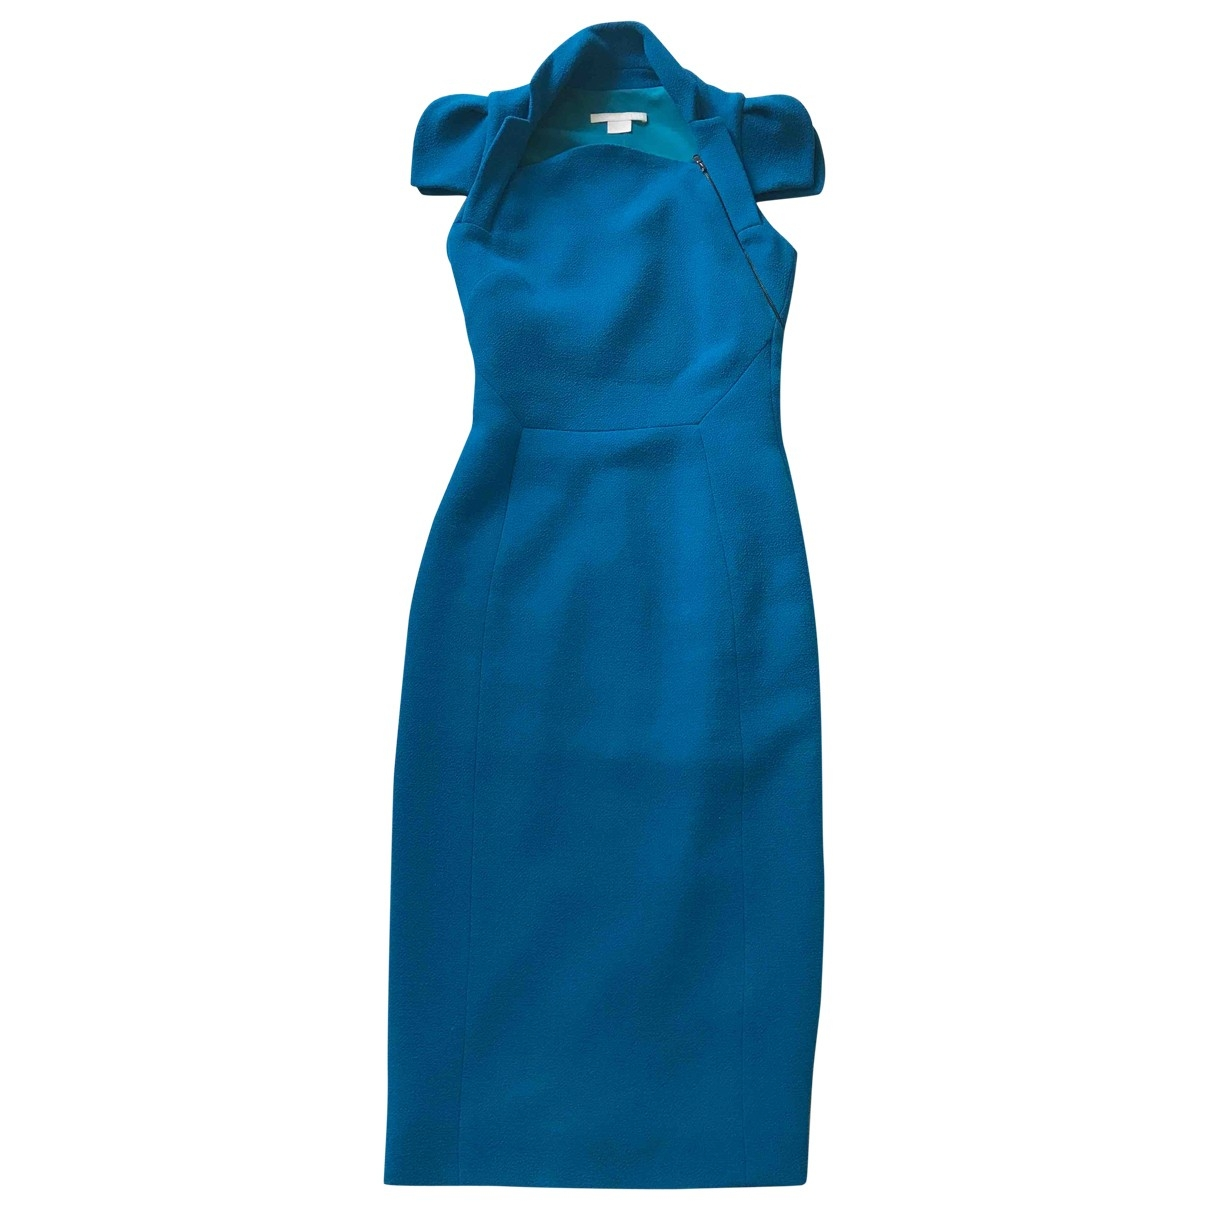 Antonio Berardi \N Turquoise Wool dress for Women 38 IT